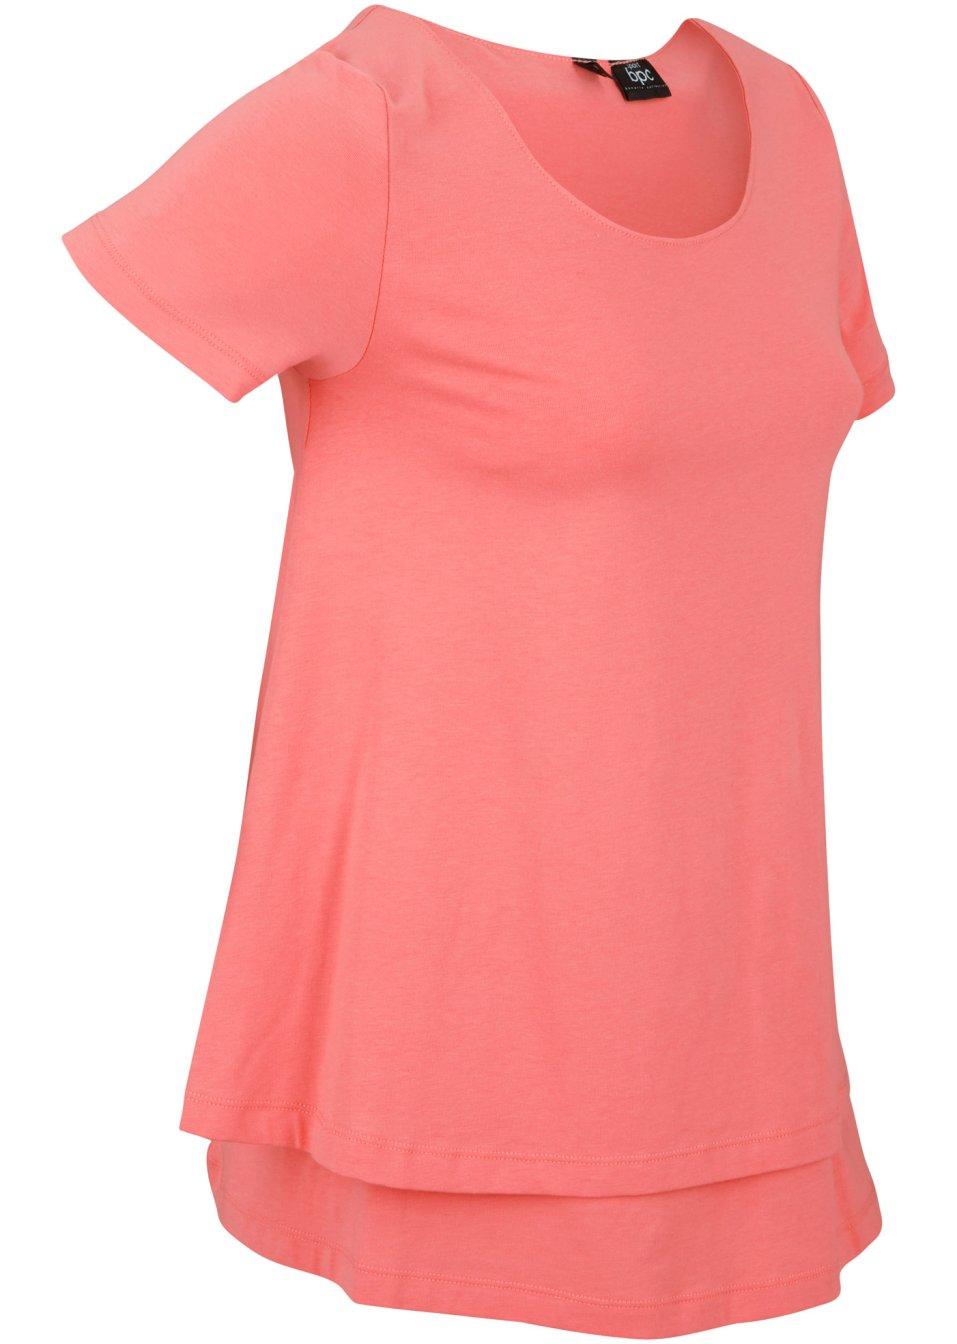 Nachhaltiges Sport-Shirt rauchkoralle - Damen - bpc bonprix collection - bonprix.de Qbb2Z ojcZo